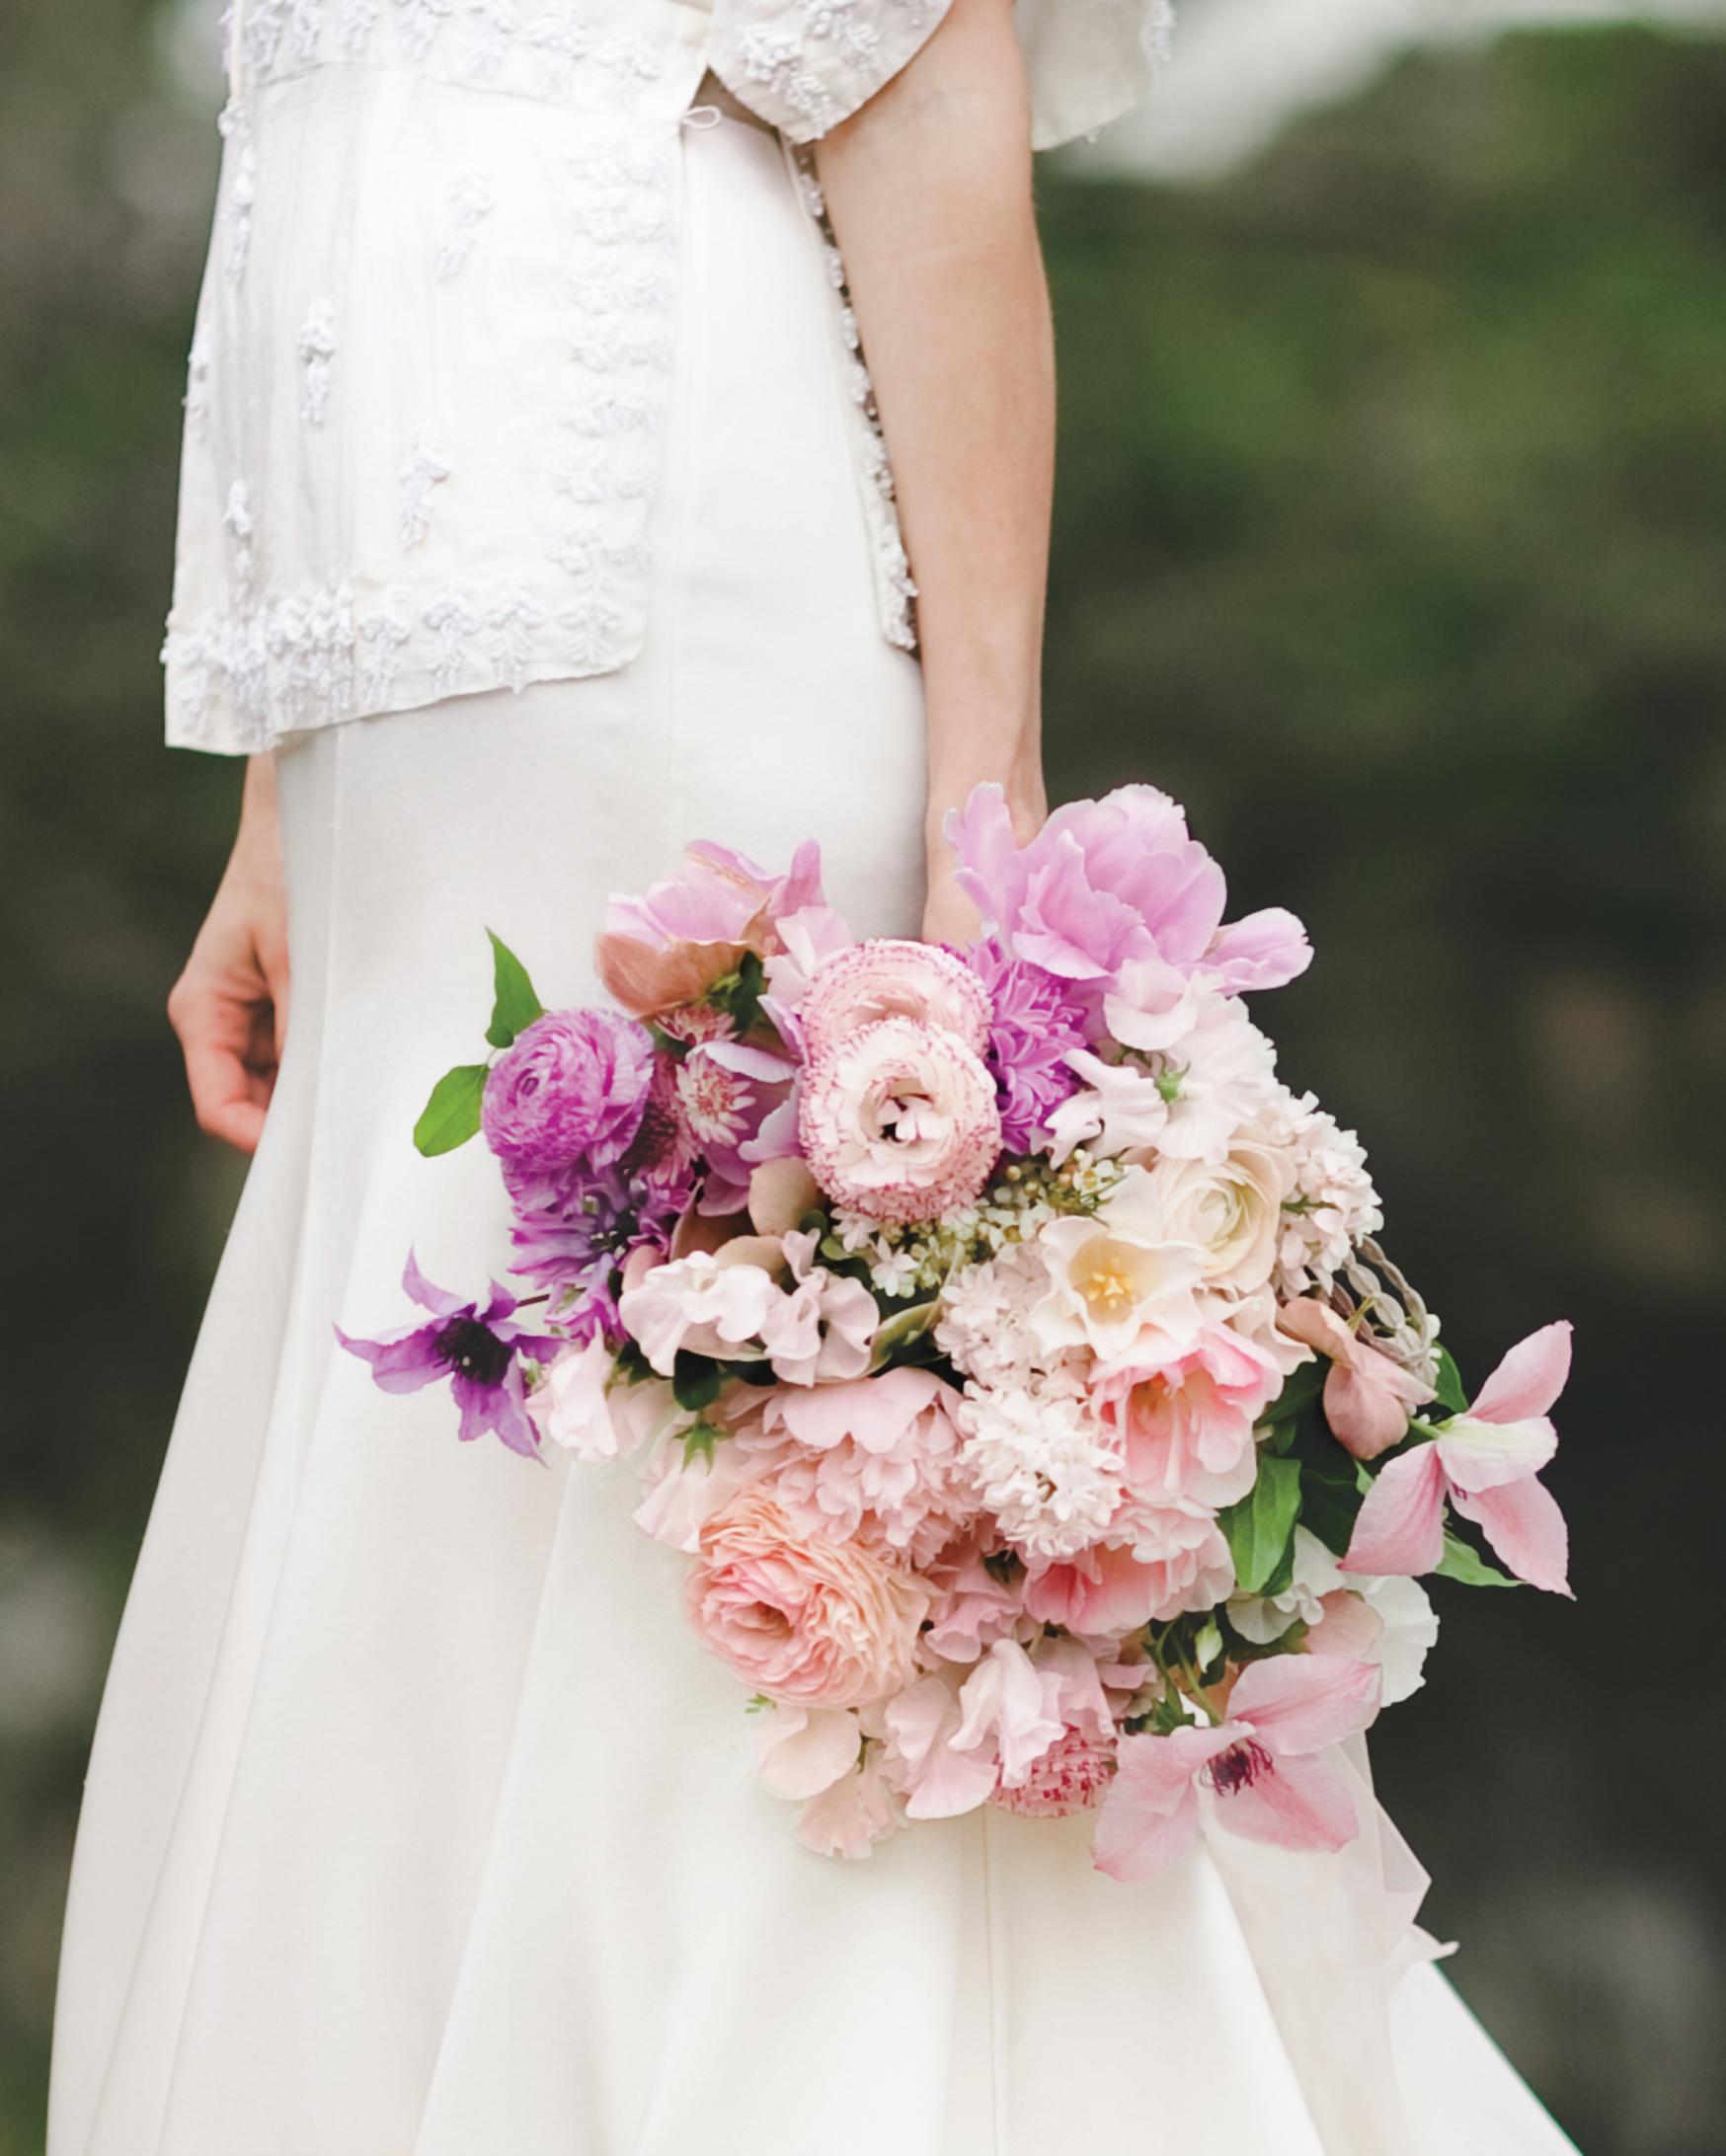 bouquet-weddinggown-winn-bowman-thenichols-263-mwds110732.jpg